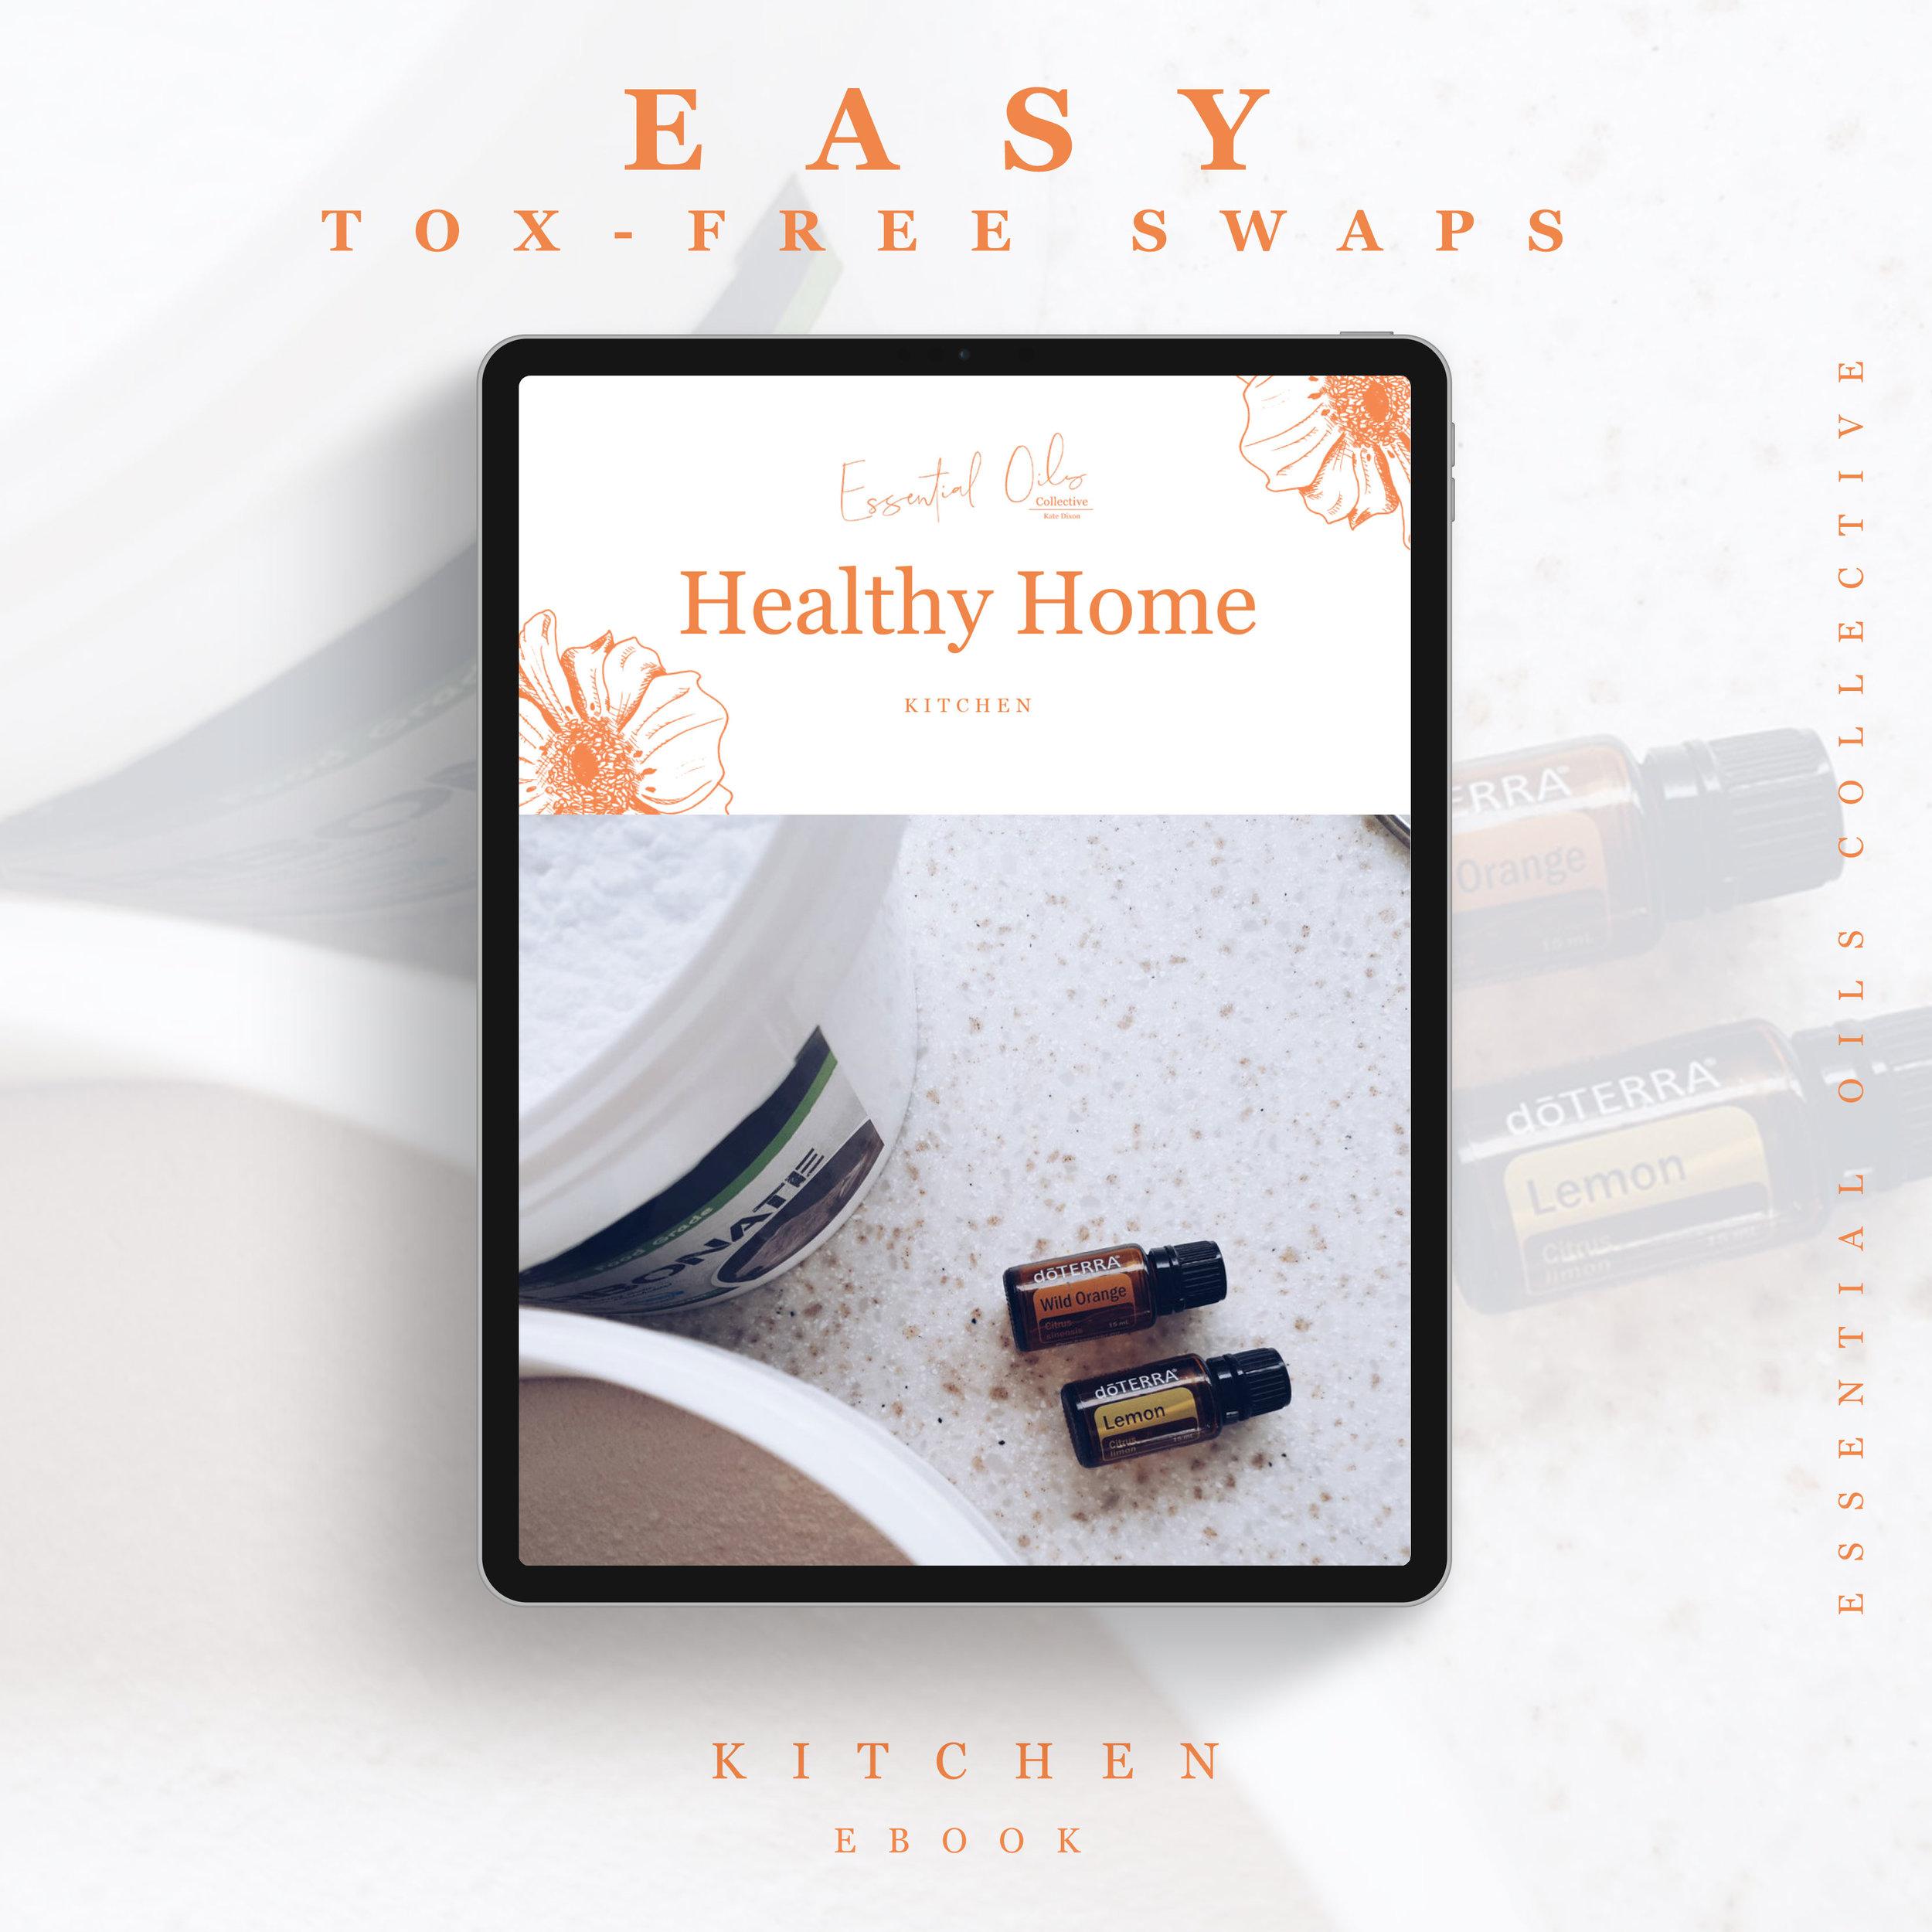 Promo_HealthyHome_Kitchen_V0.jpg